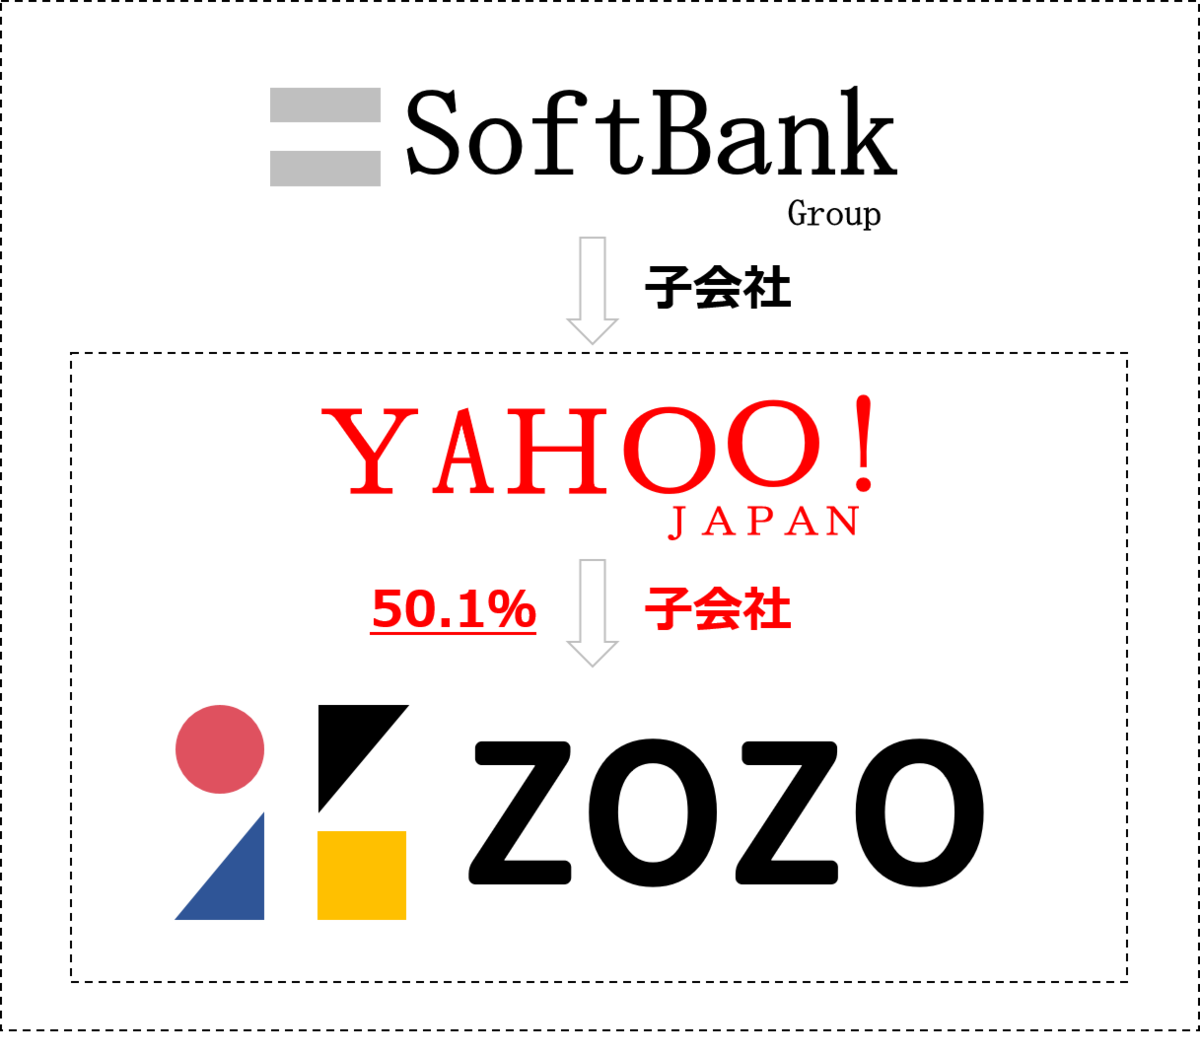 f:id:koala_log:20190912143516p:plain